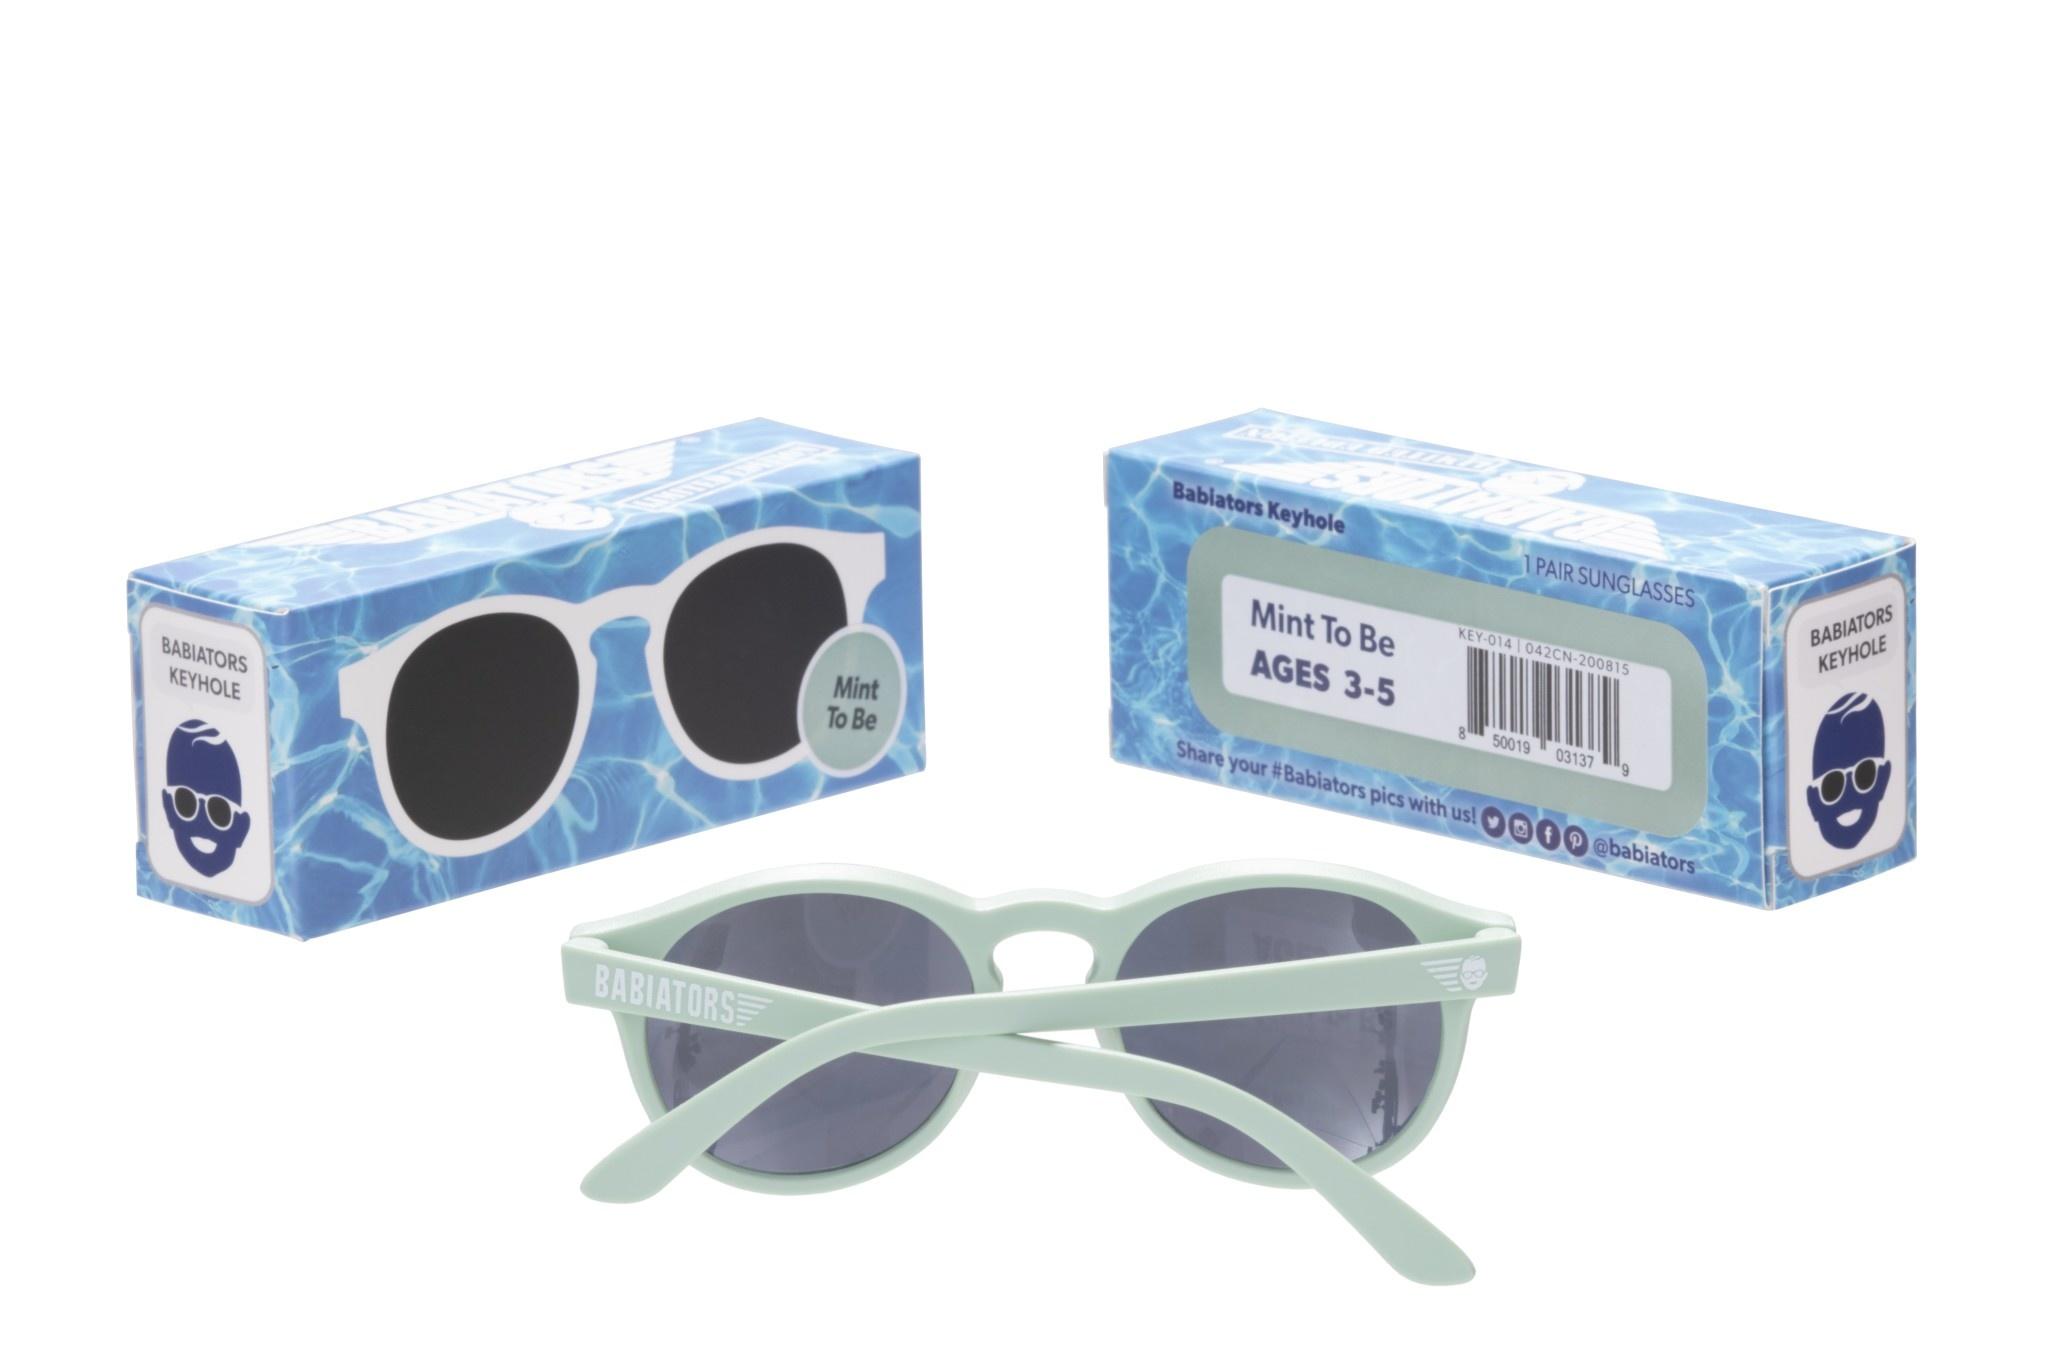 Keyhole Style Sunglasses - Mint to Be